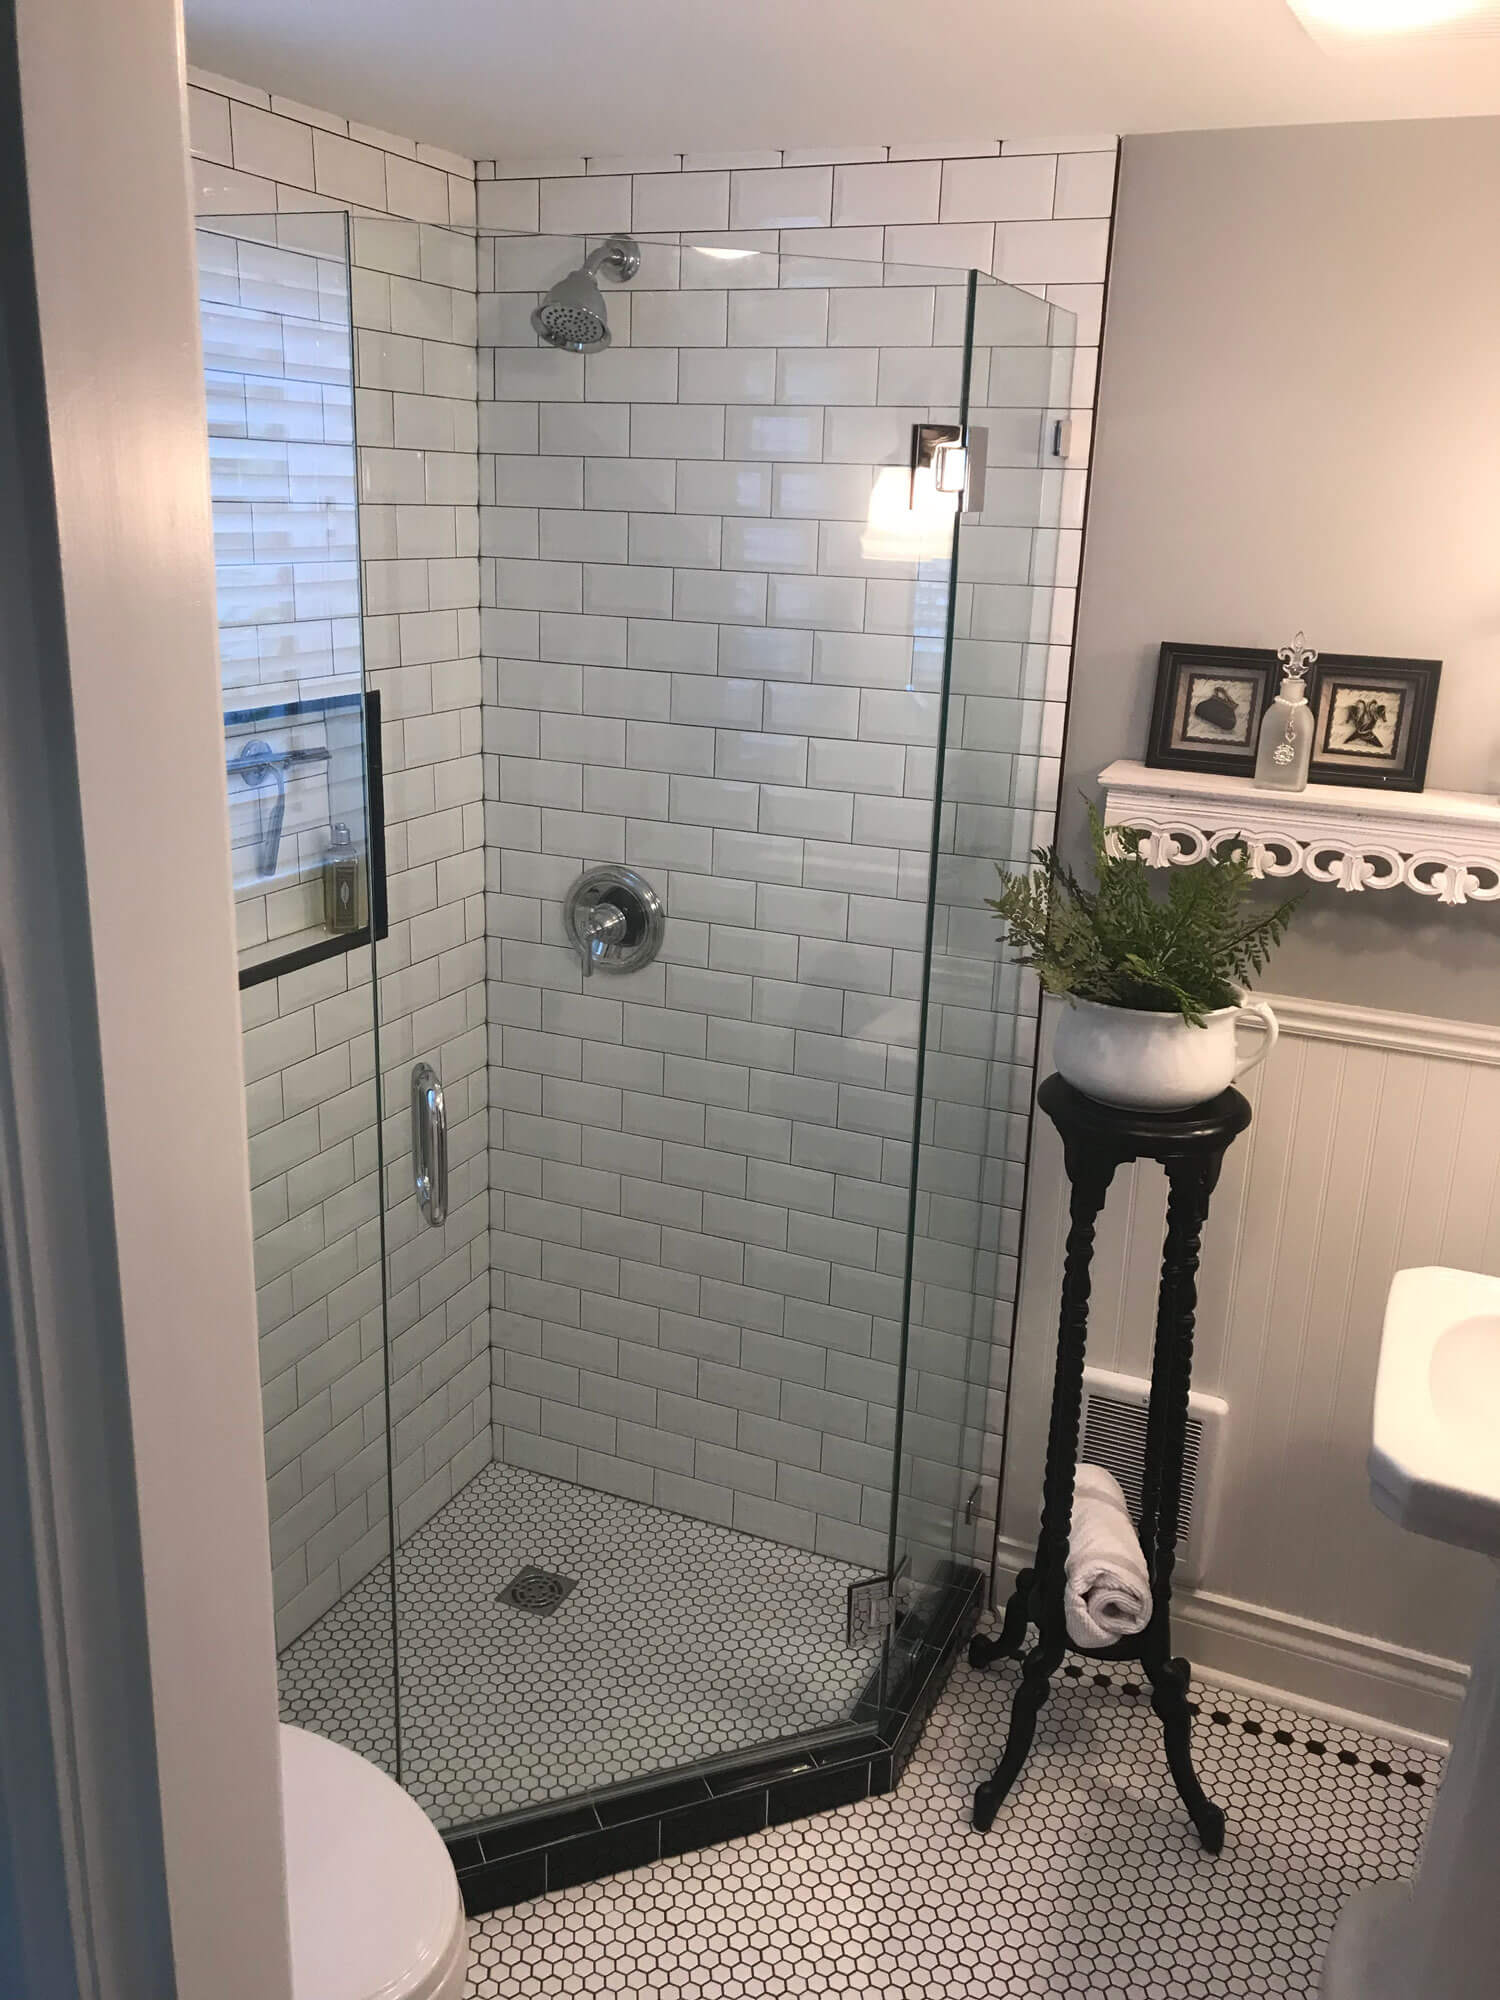 Bathroom Renovations in Victoria BC - Kinnee Contracting